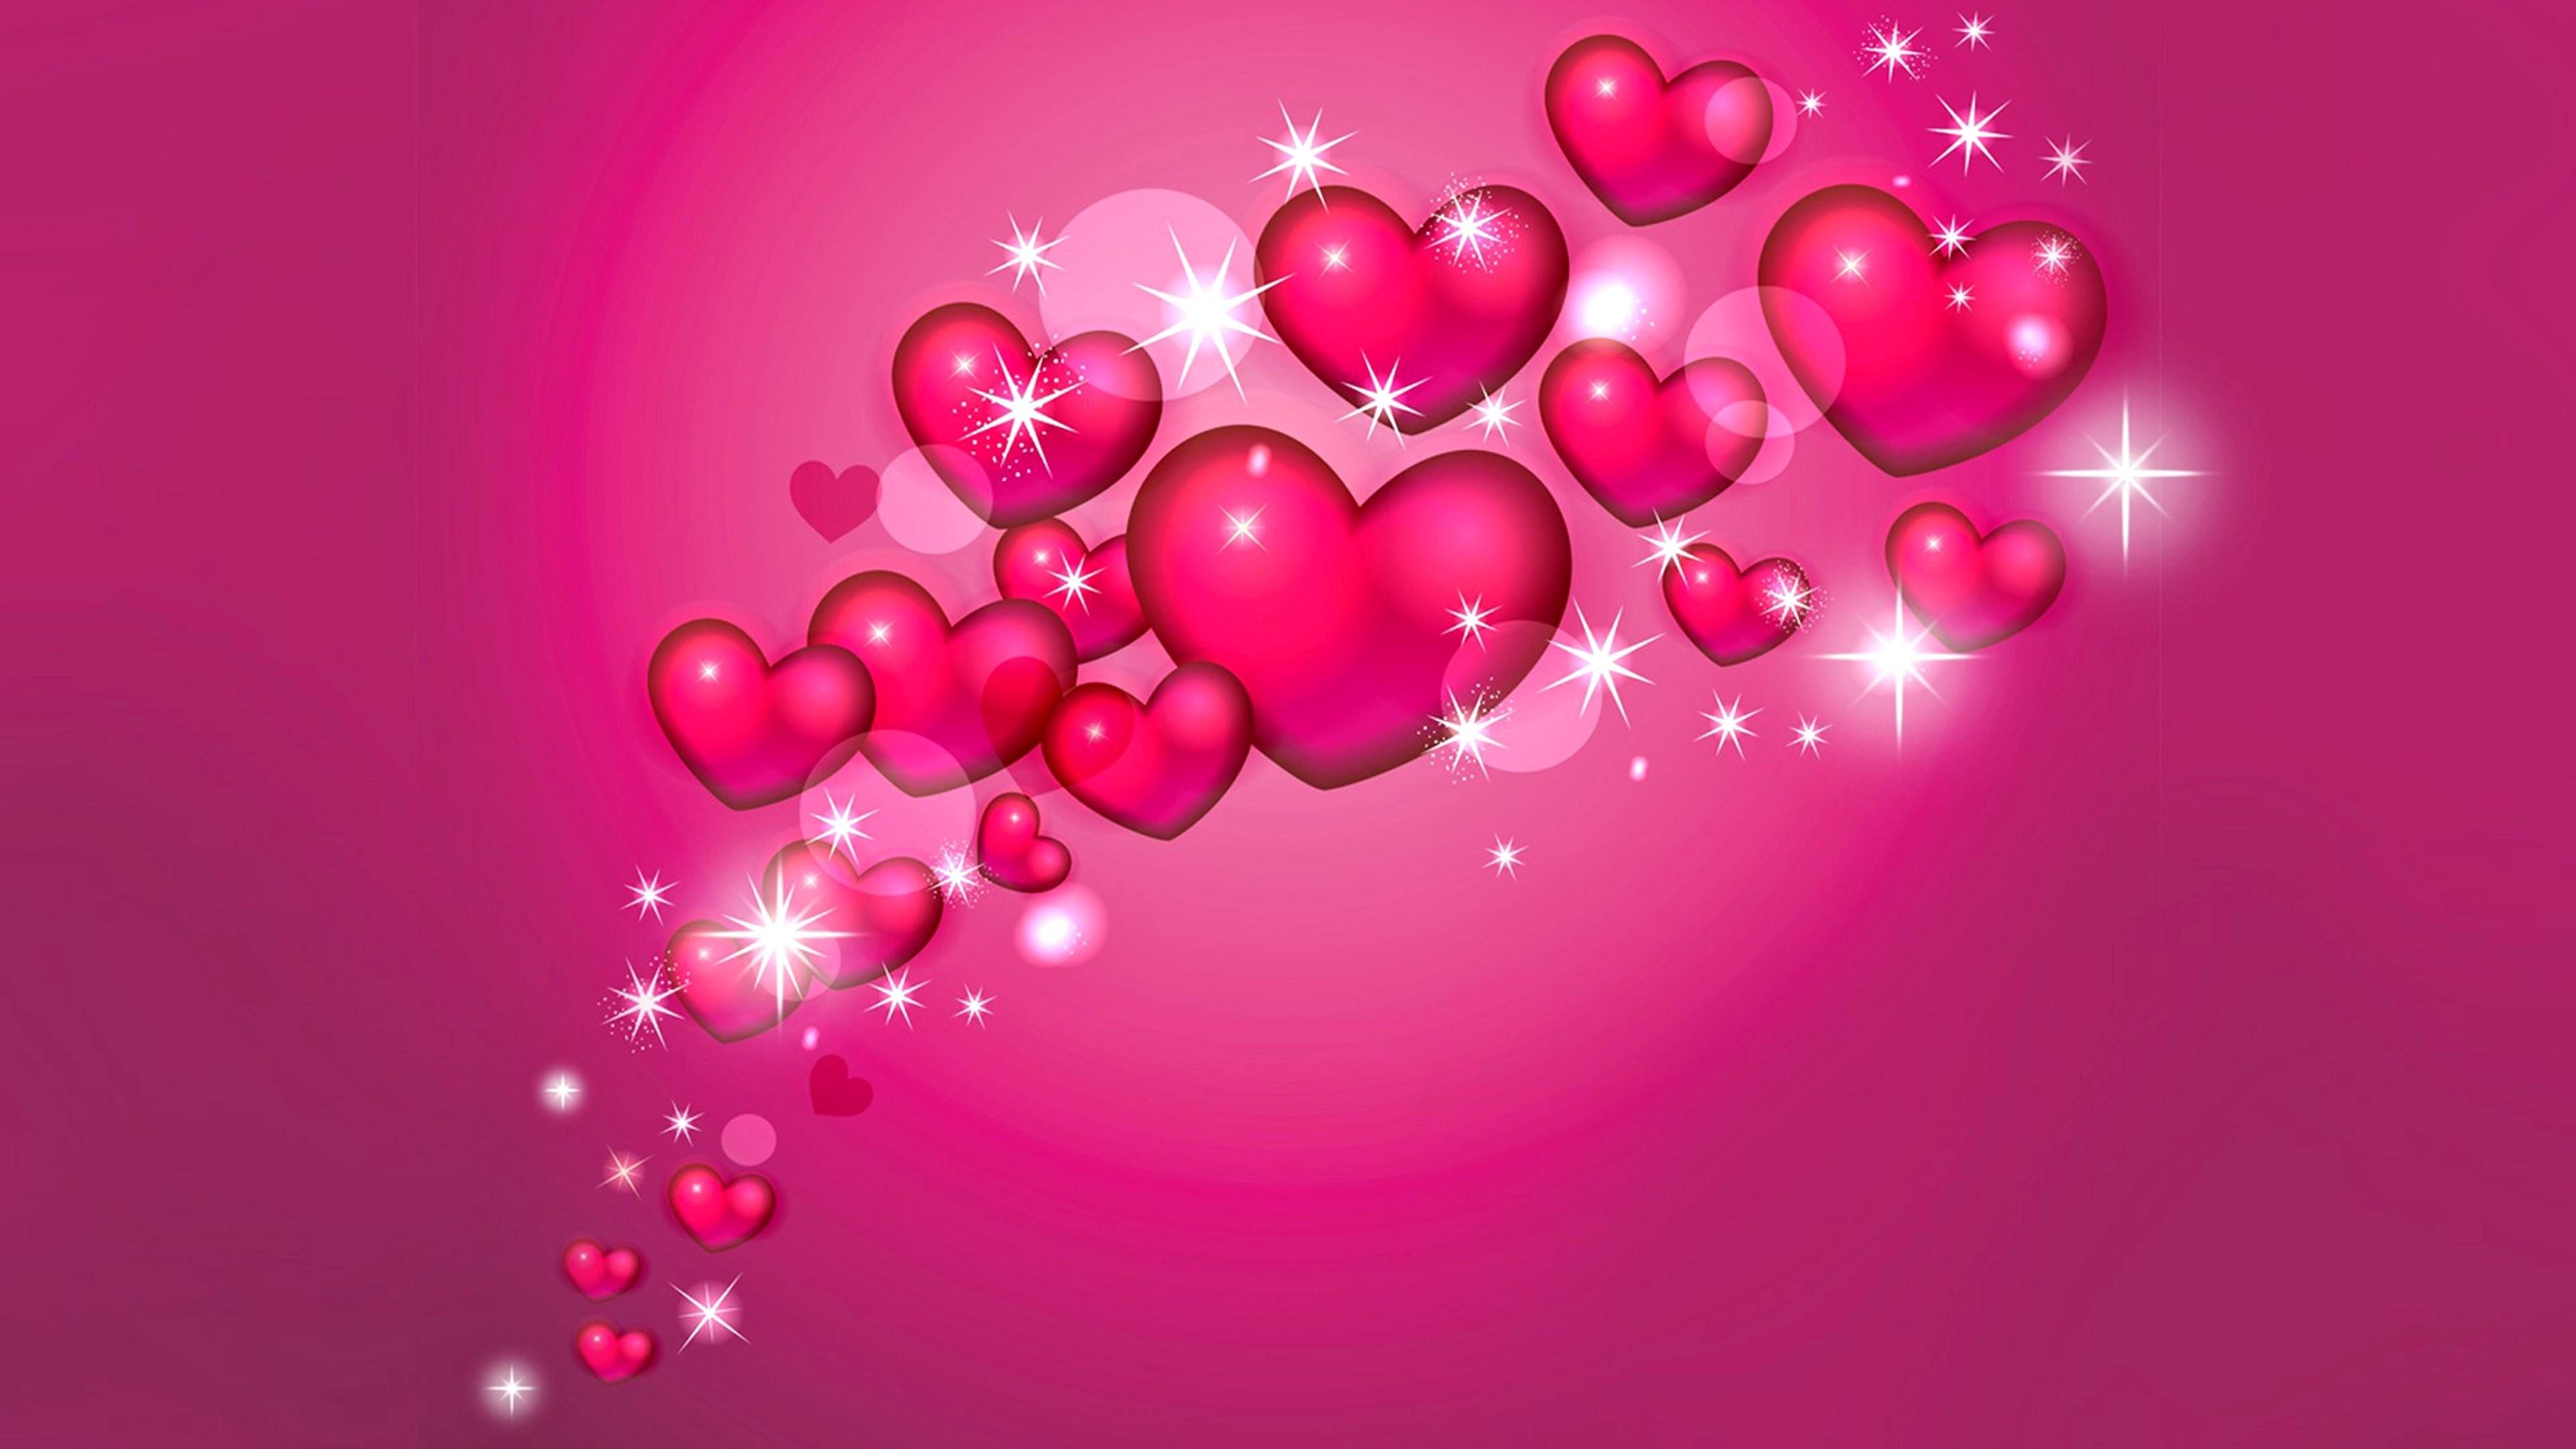 Heart Wallpapers Wallpapertag